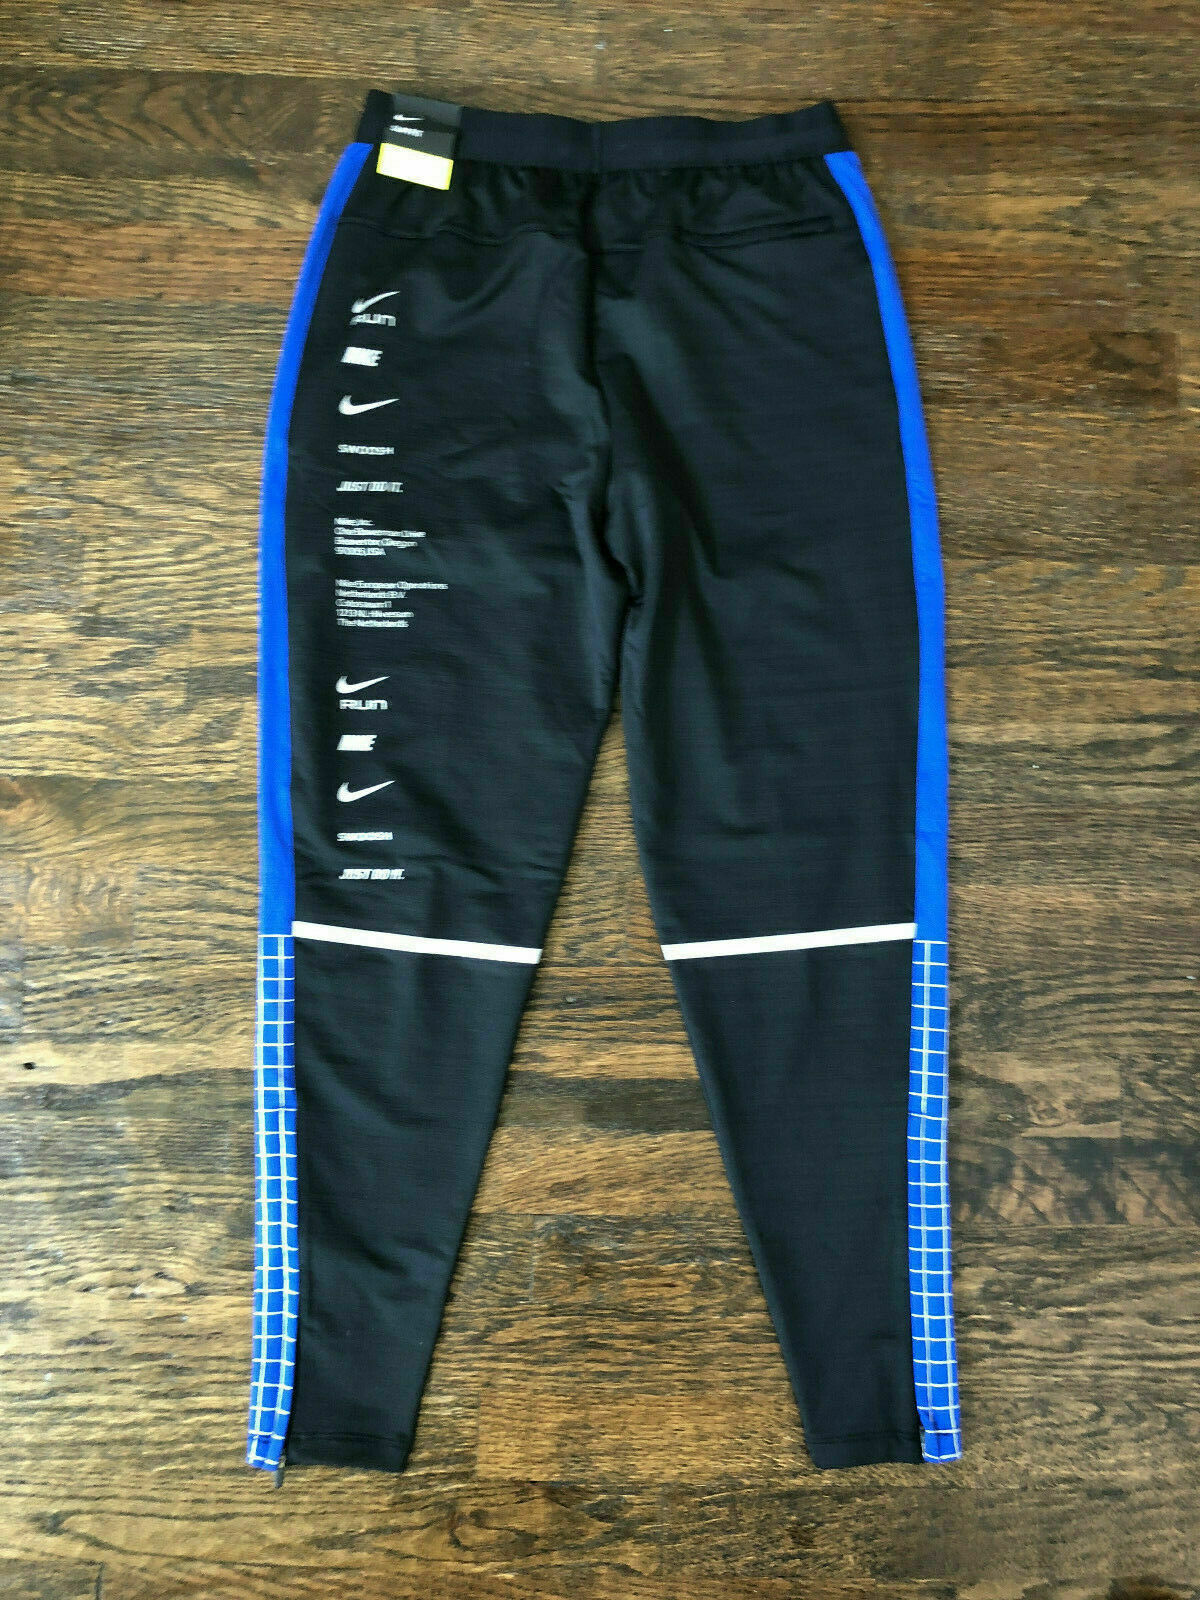 Nike Microbranding Phenom Running Pants Bq8189 010 Men's Size S Slim Fit